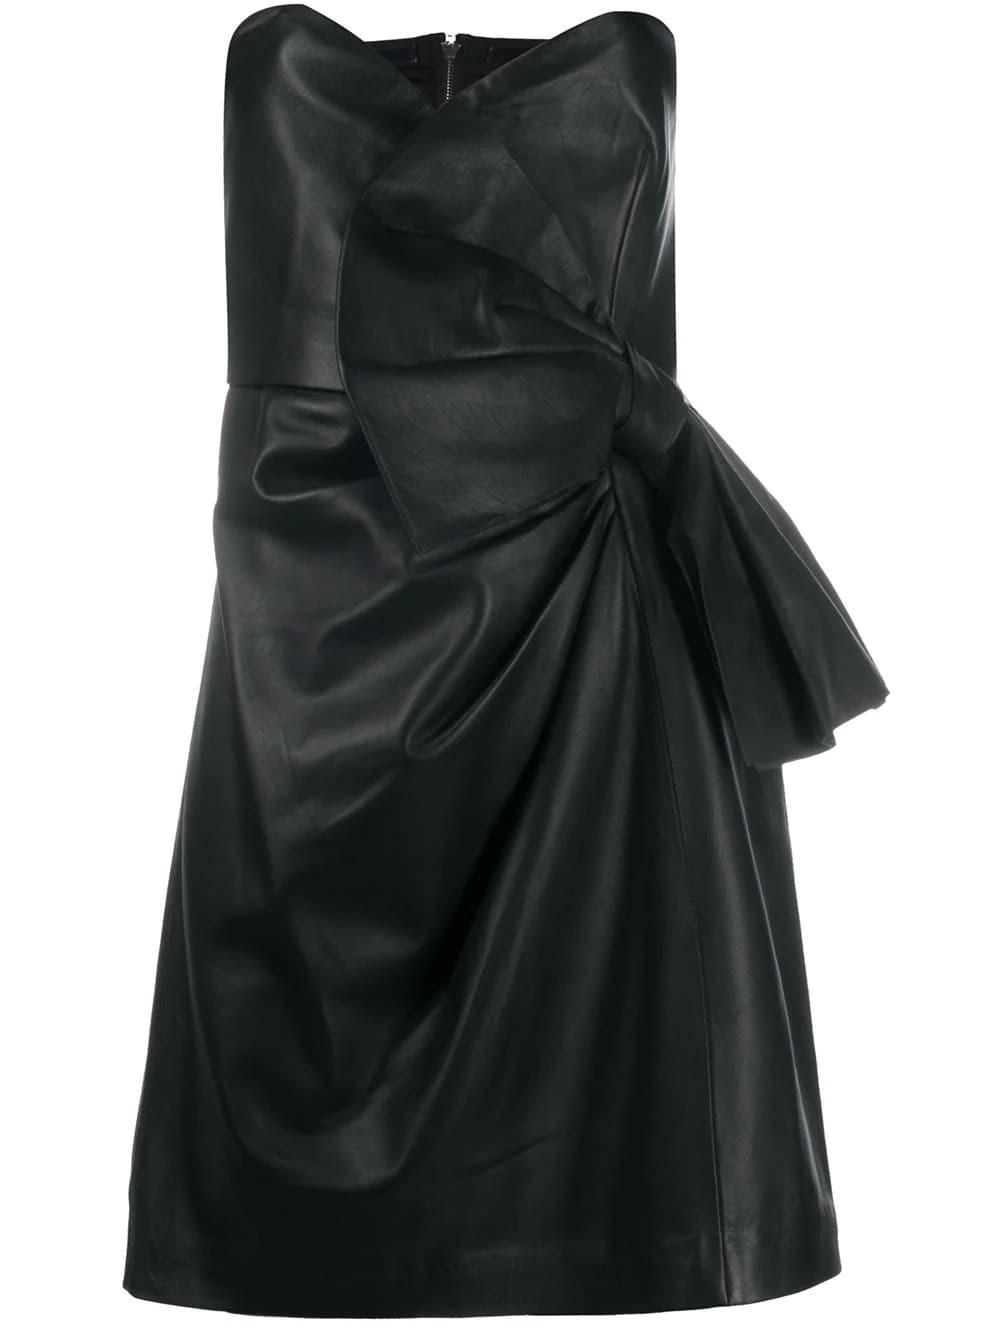 REDVALENTINO Leather Sheath Dress